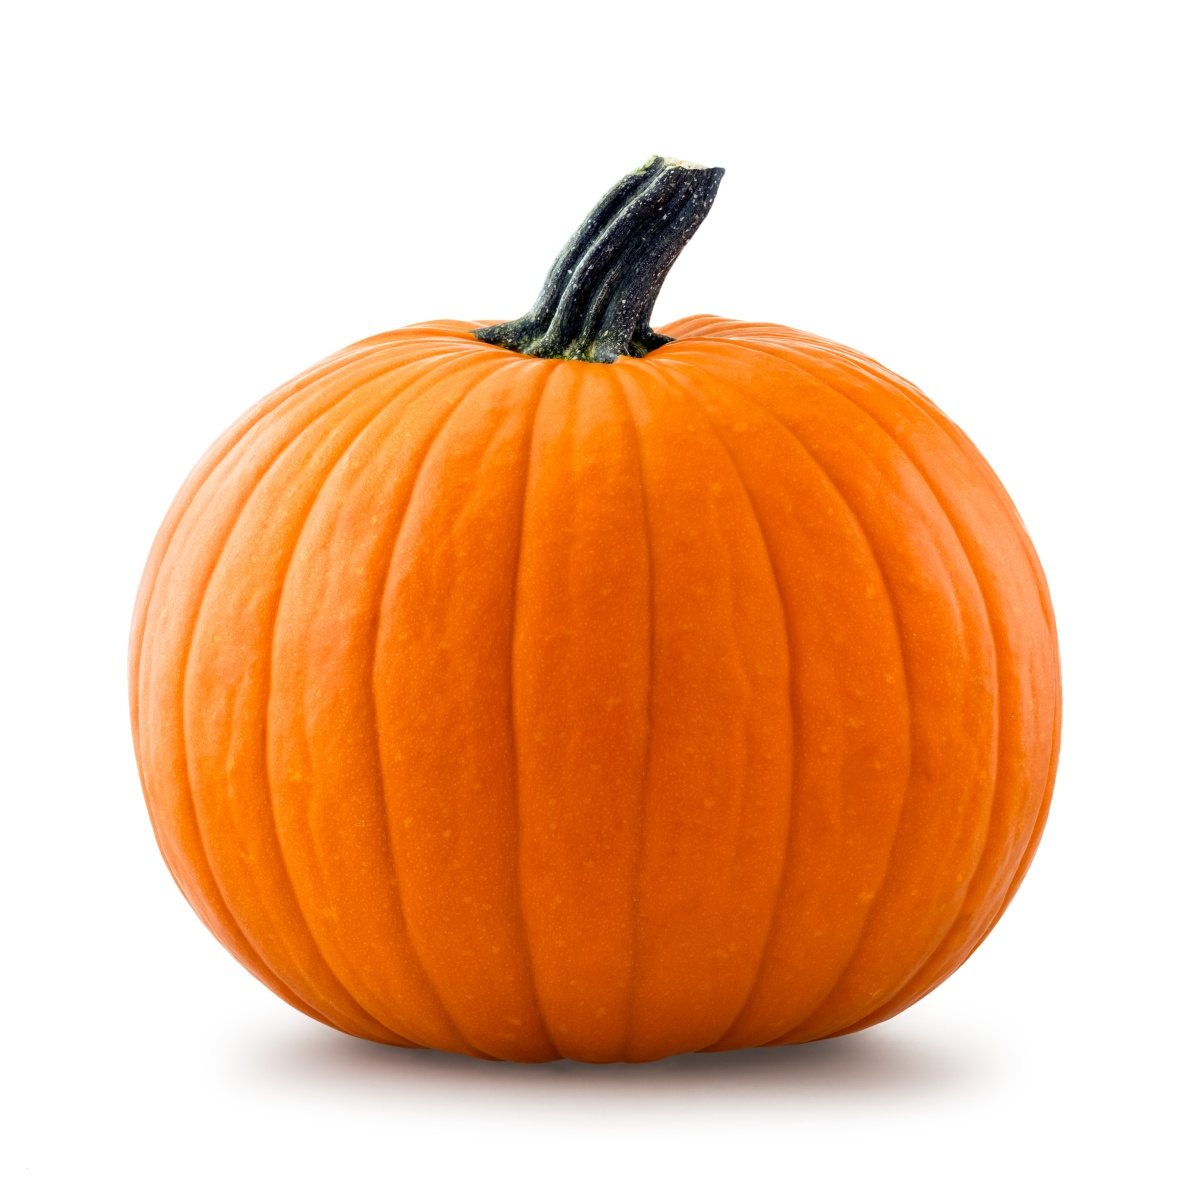 Pump Up Your Beauty Routine With Pumpkin Diy Pumpkin